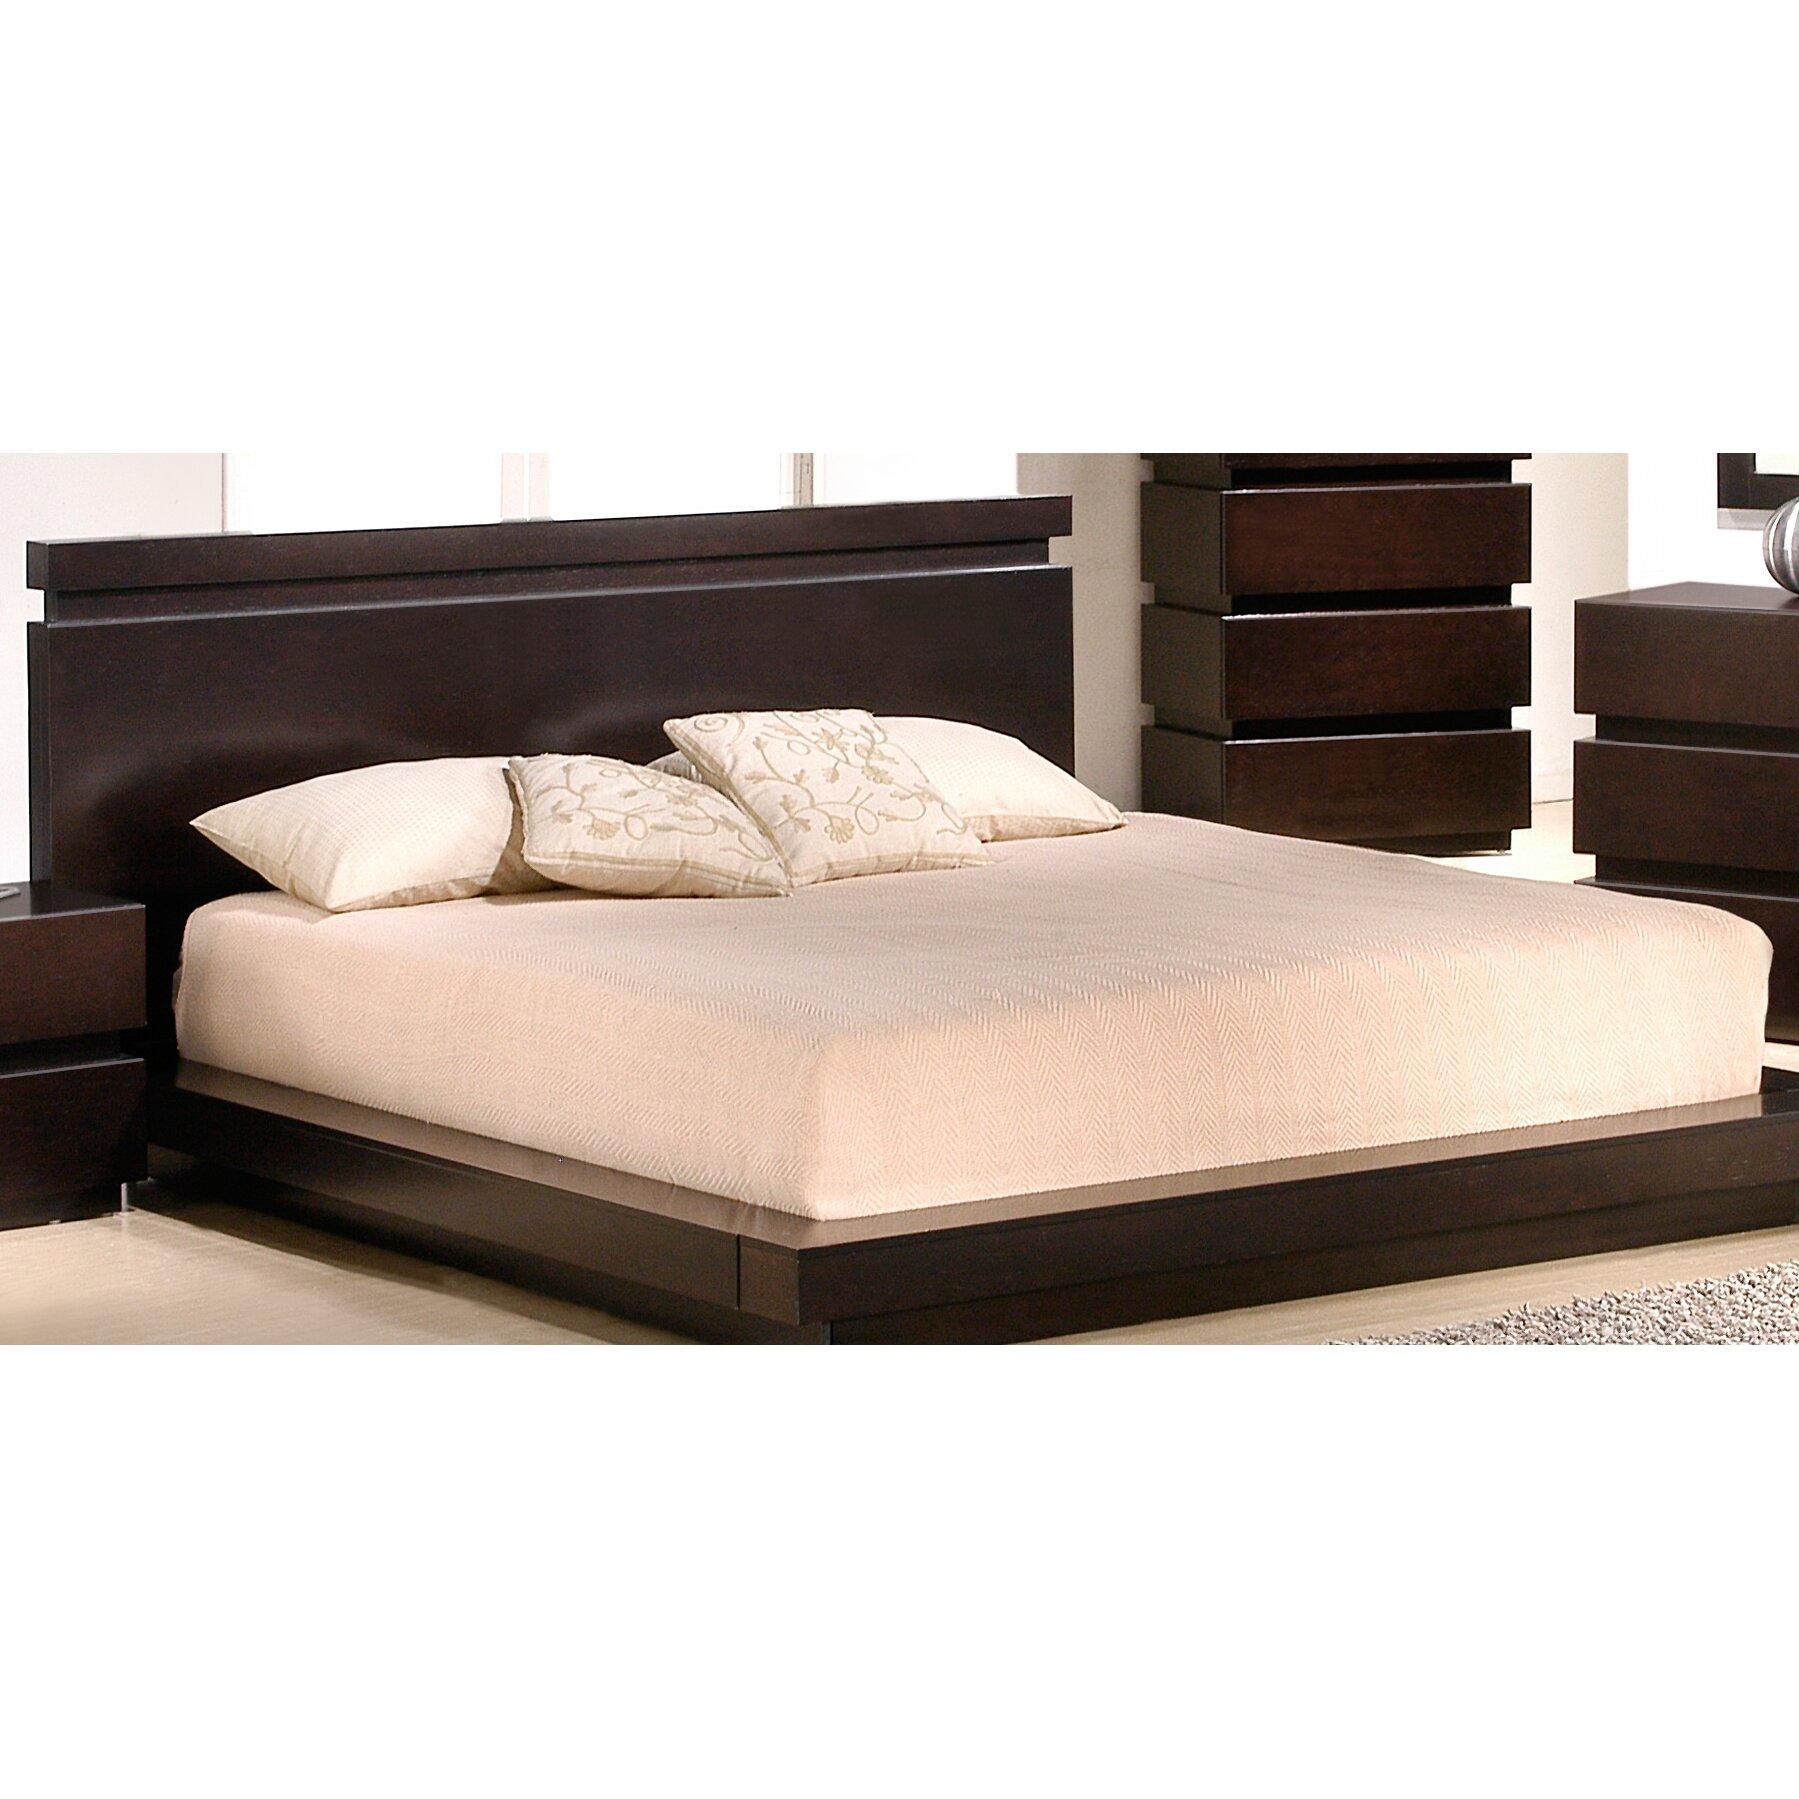 J M Furniture Knotch Platform Customizable Bedroom Set Reviews Allmodern